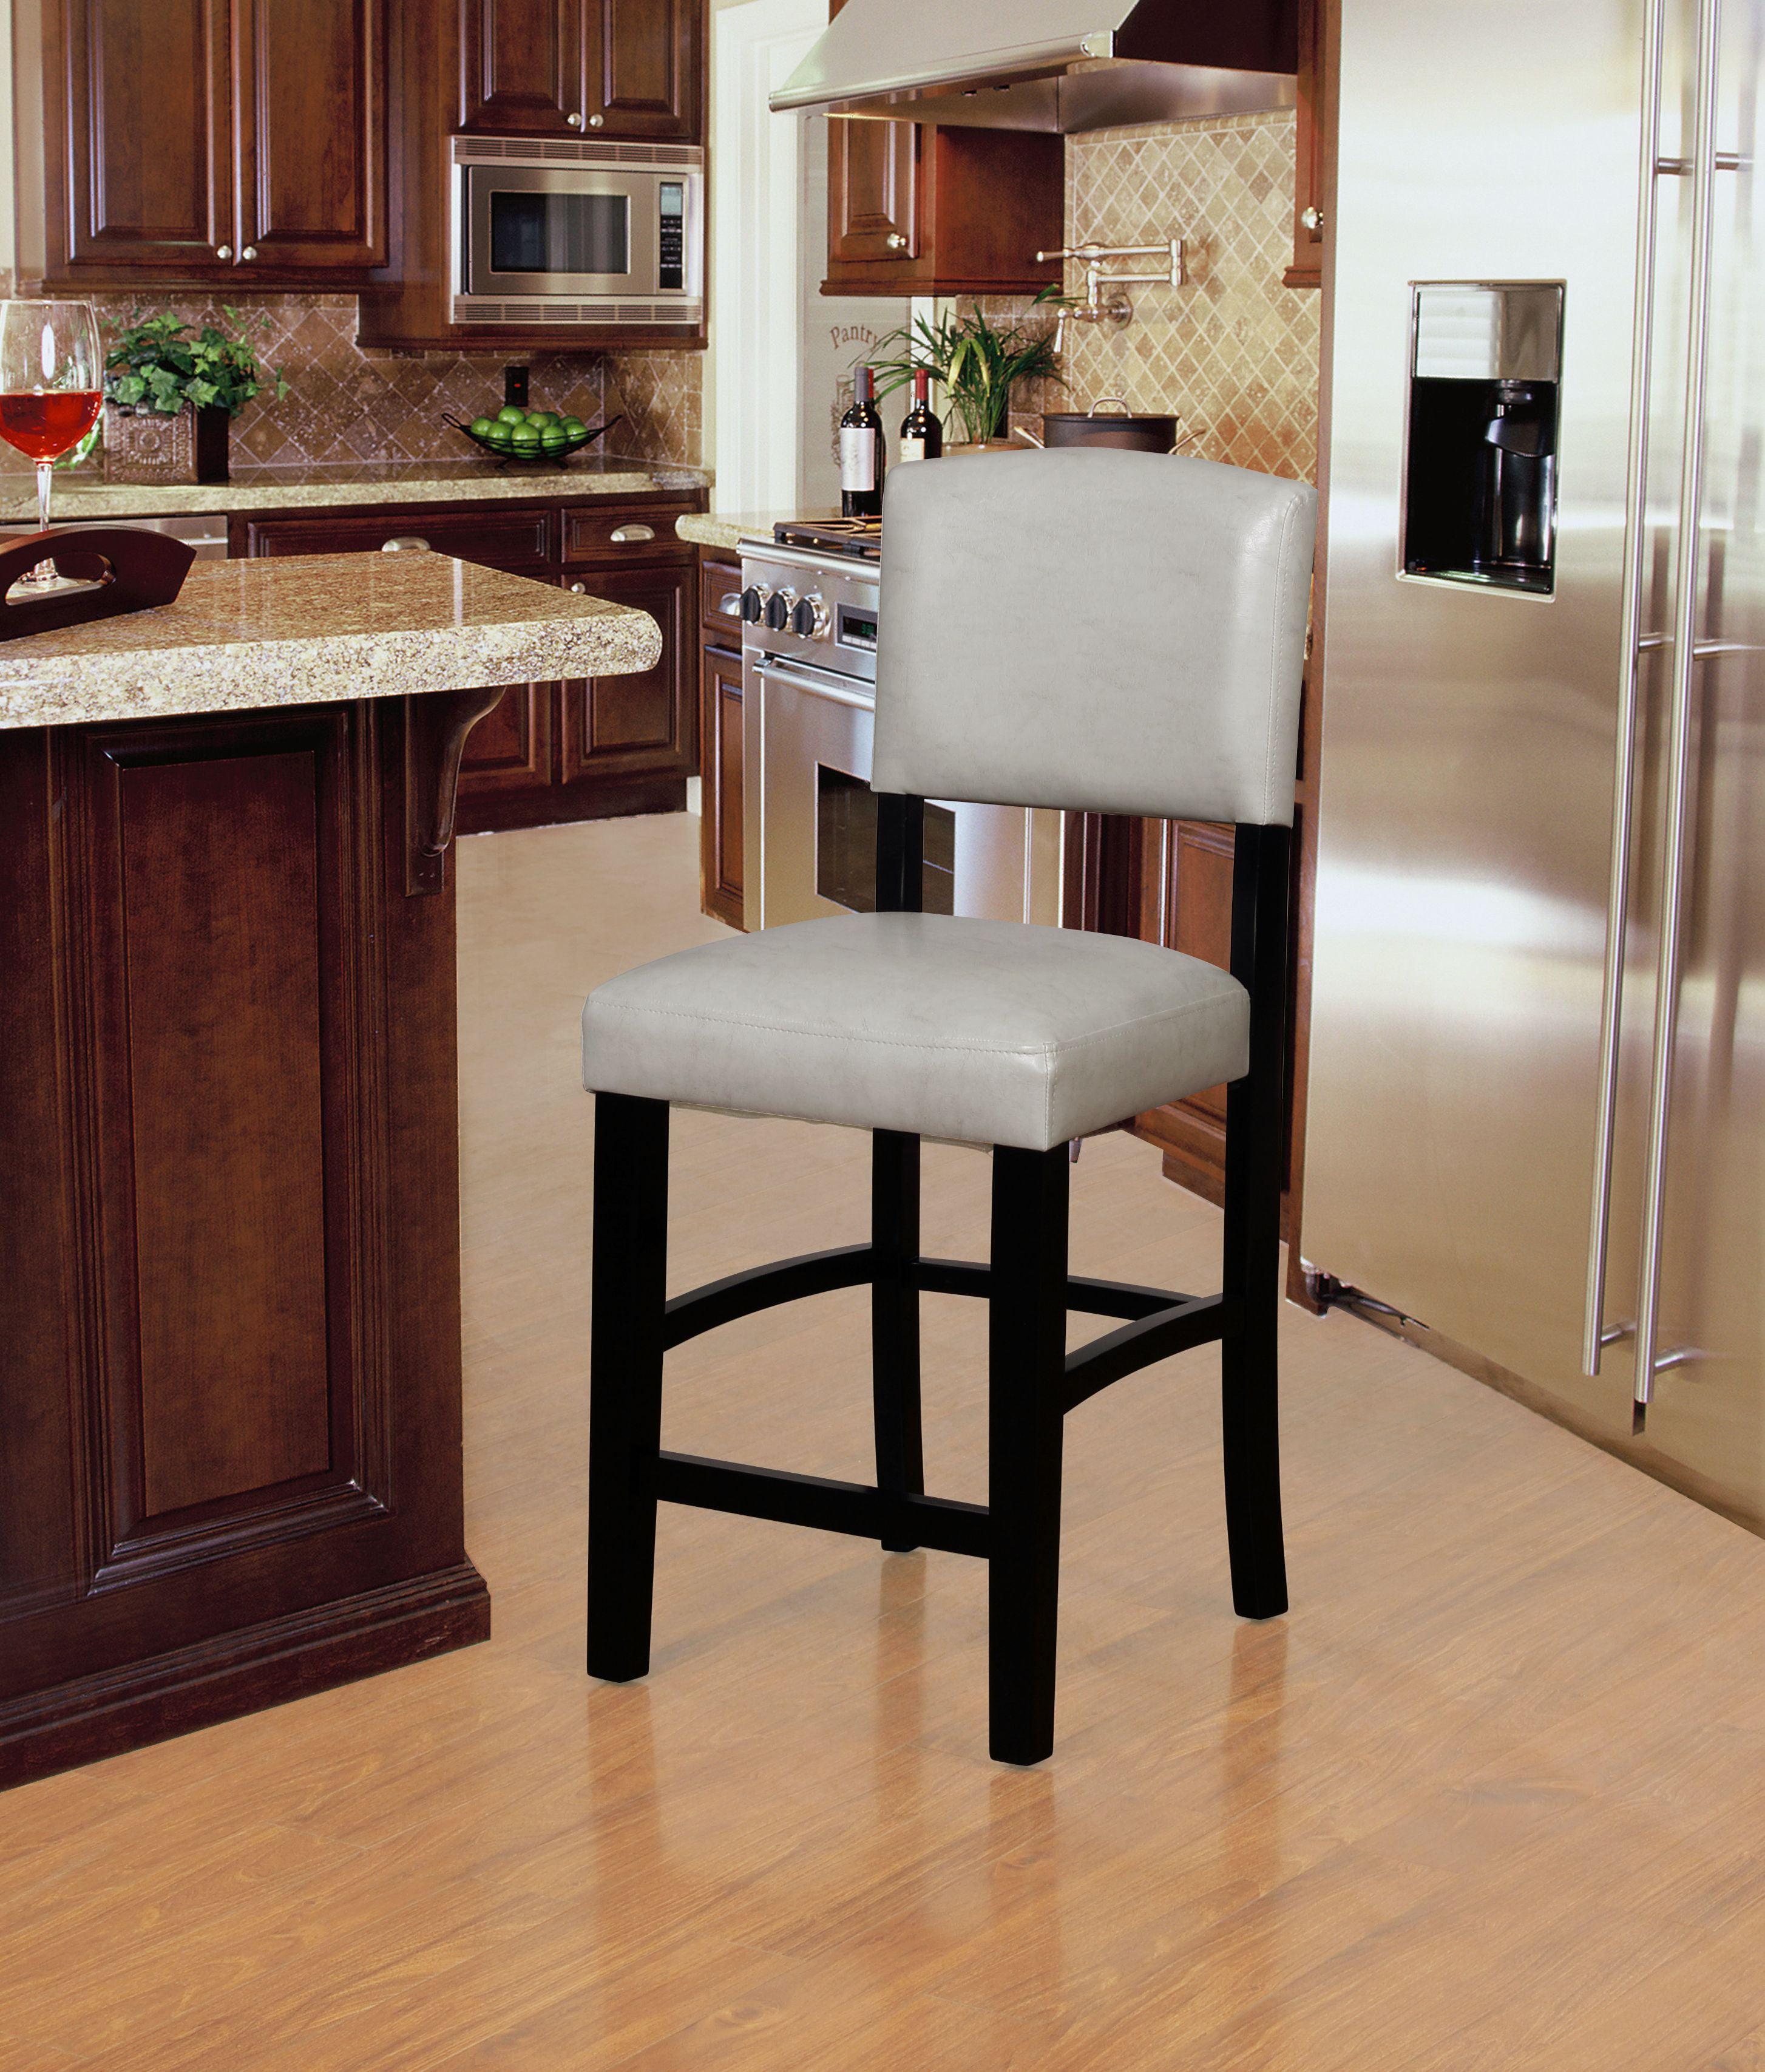 Sensational Linon Monaco Counter Stool 24 Inch Seat Height Multiple Colors Machost Co Dining Chair Design Ideas Machostcouk